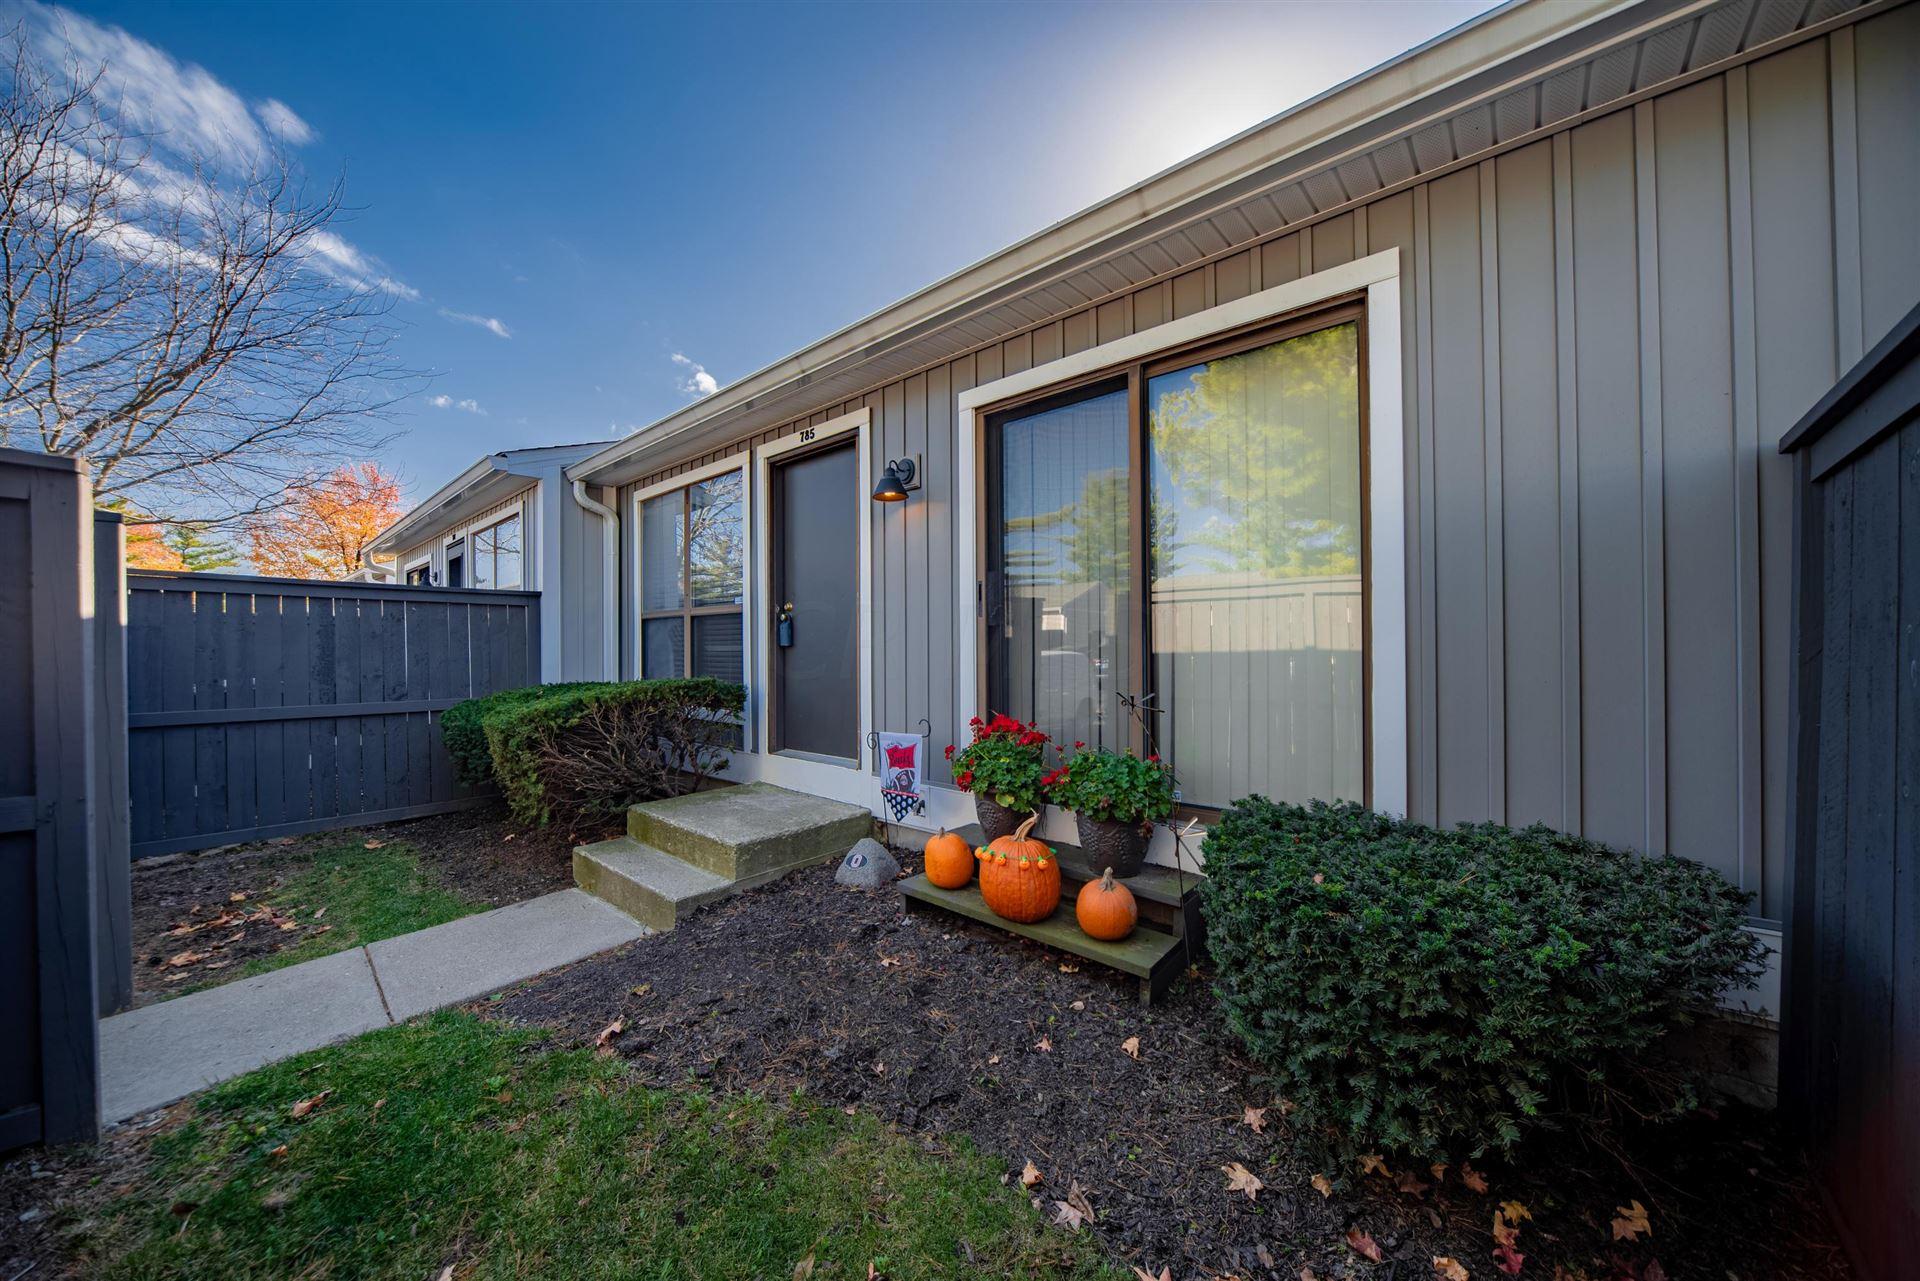 785 Plant Drive #6-B, Worthington, OH 43085 - MLS#: 220039877